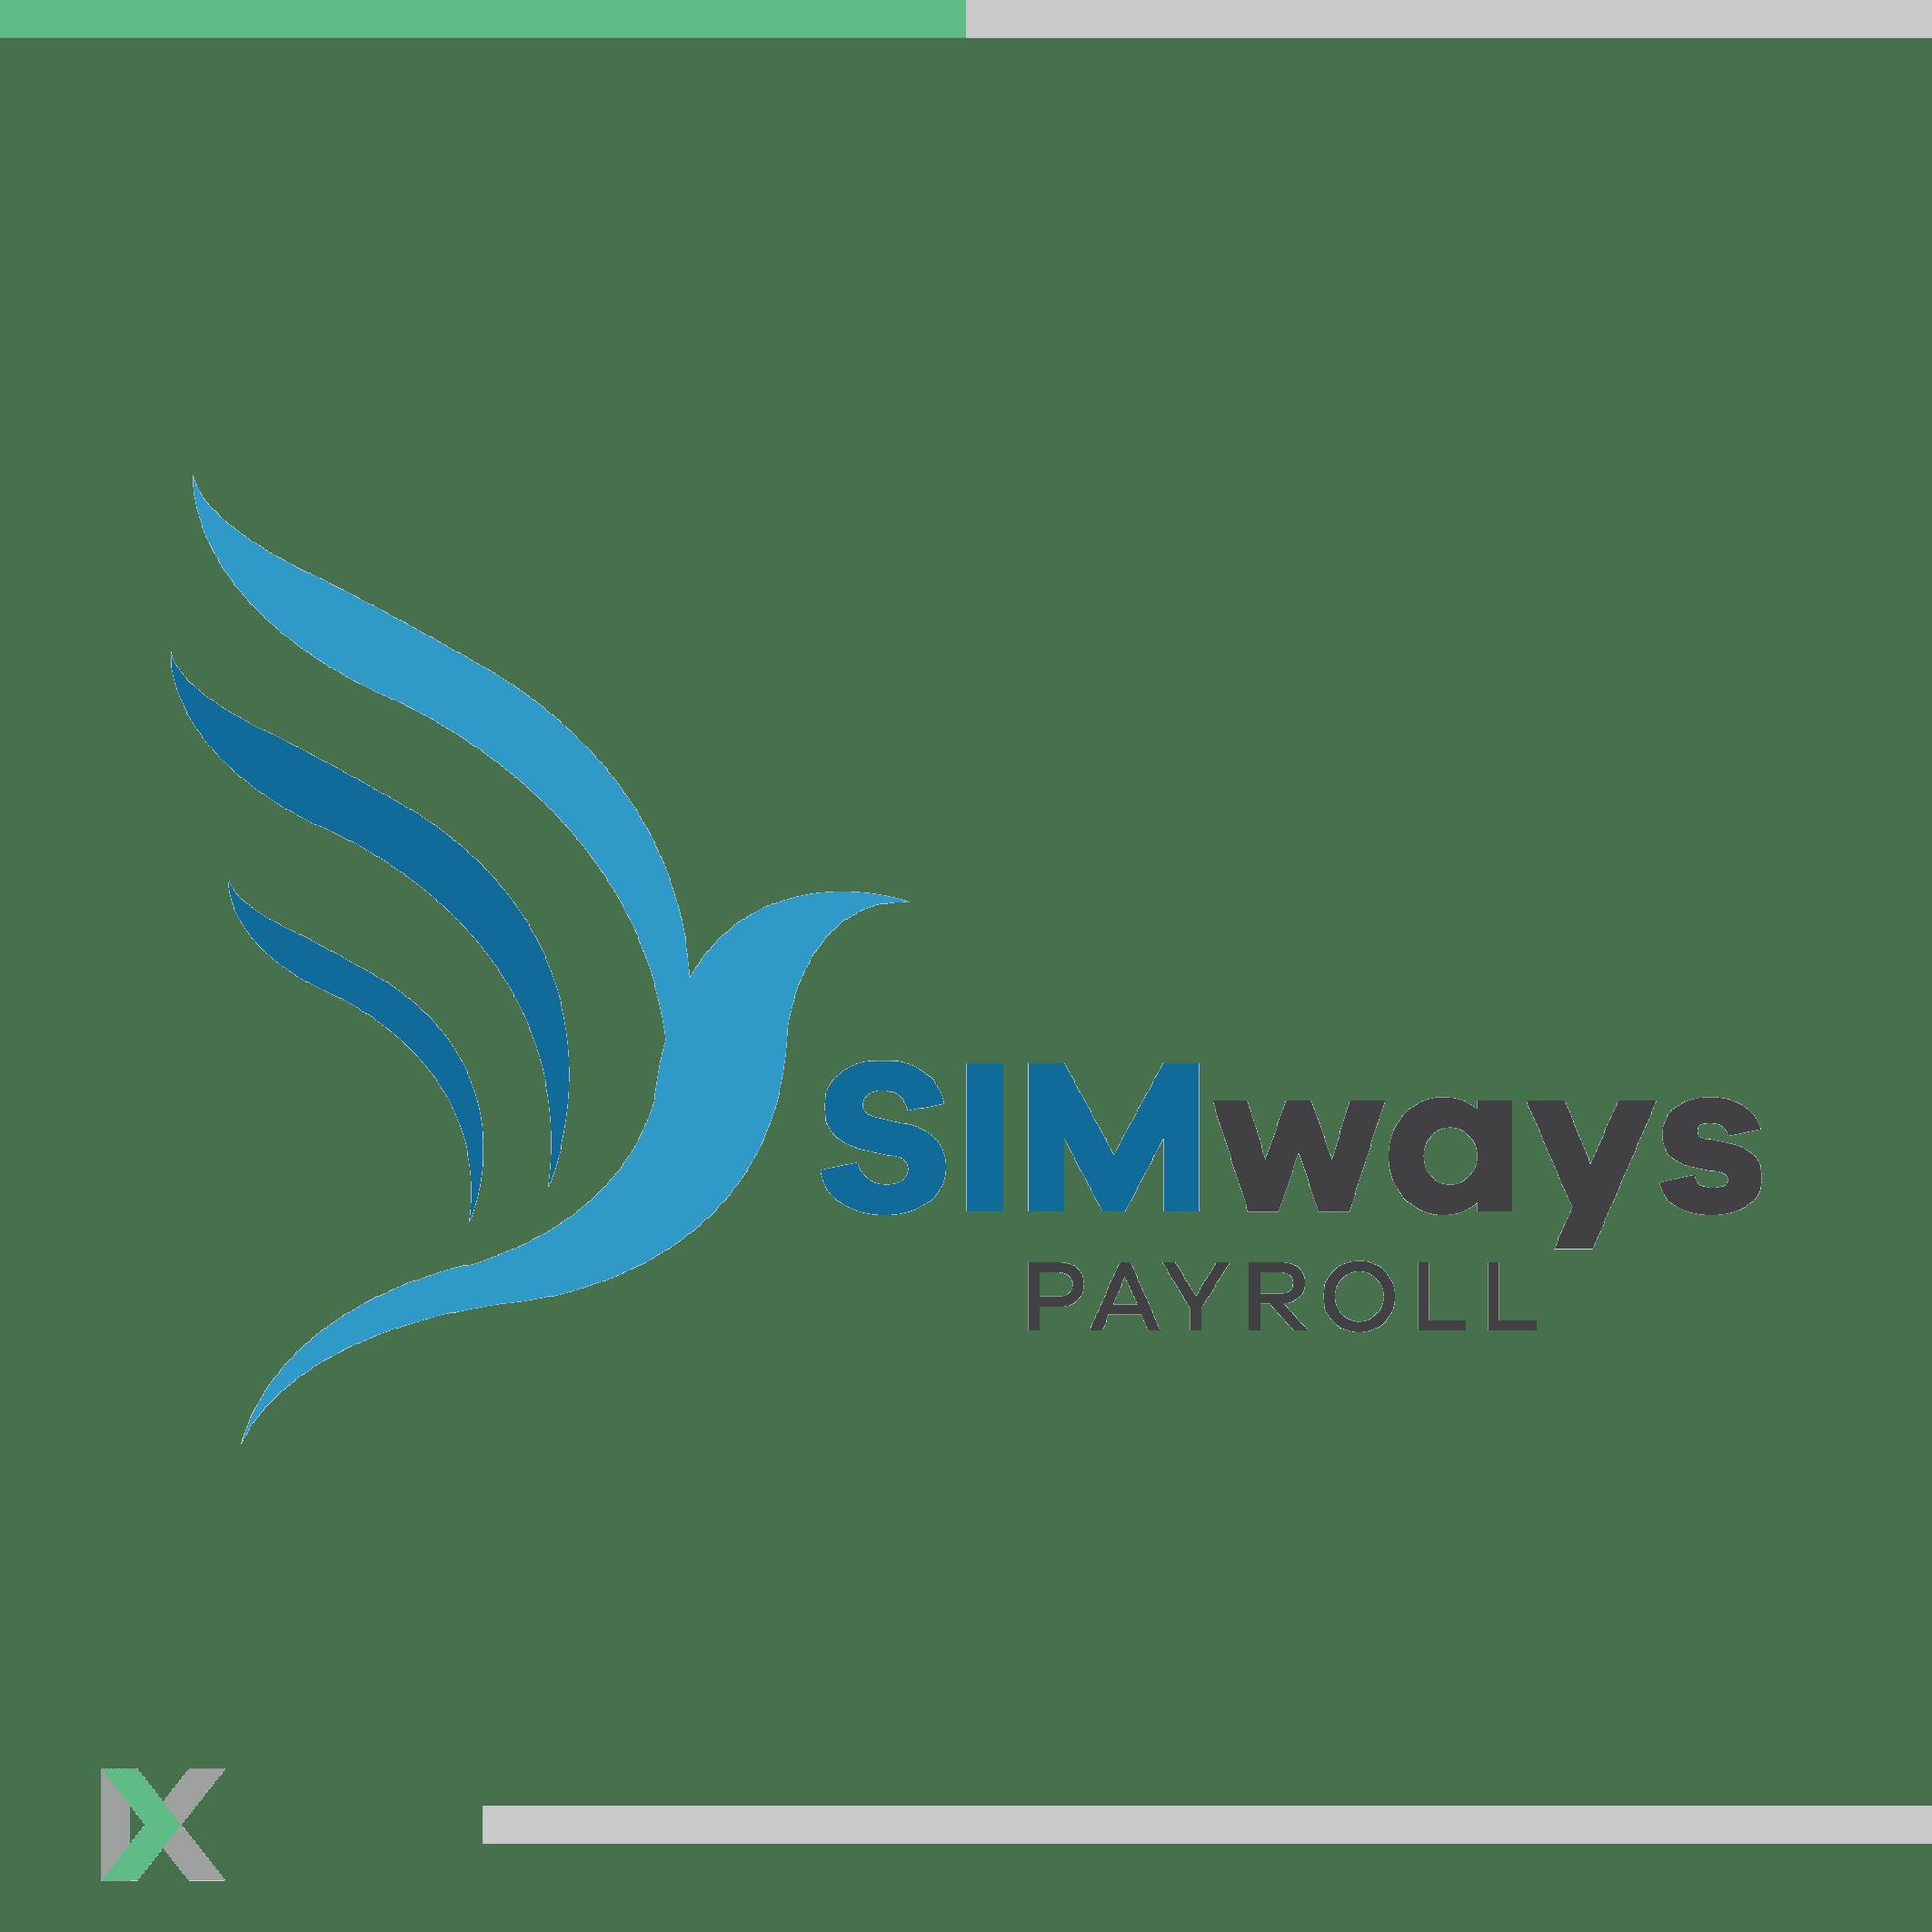 simways payroll logo